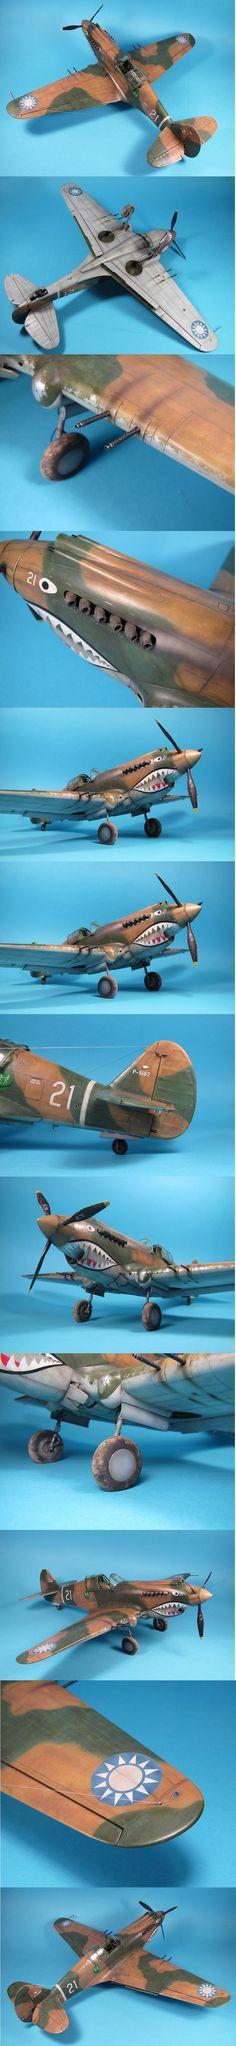 P-40 Warhawk   unknown scale